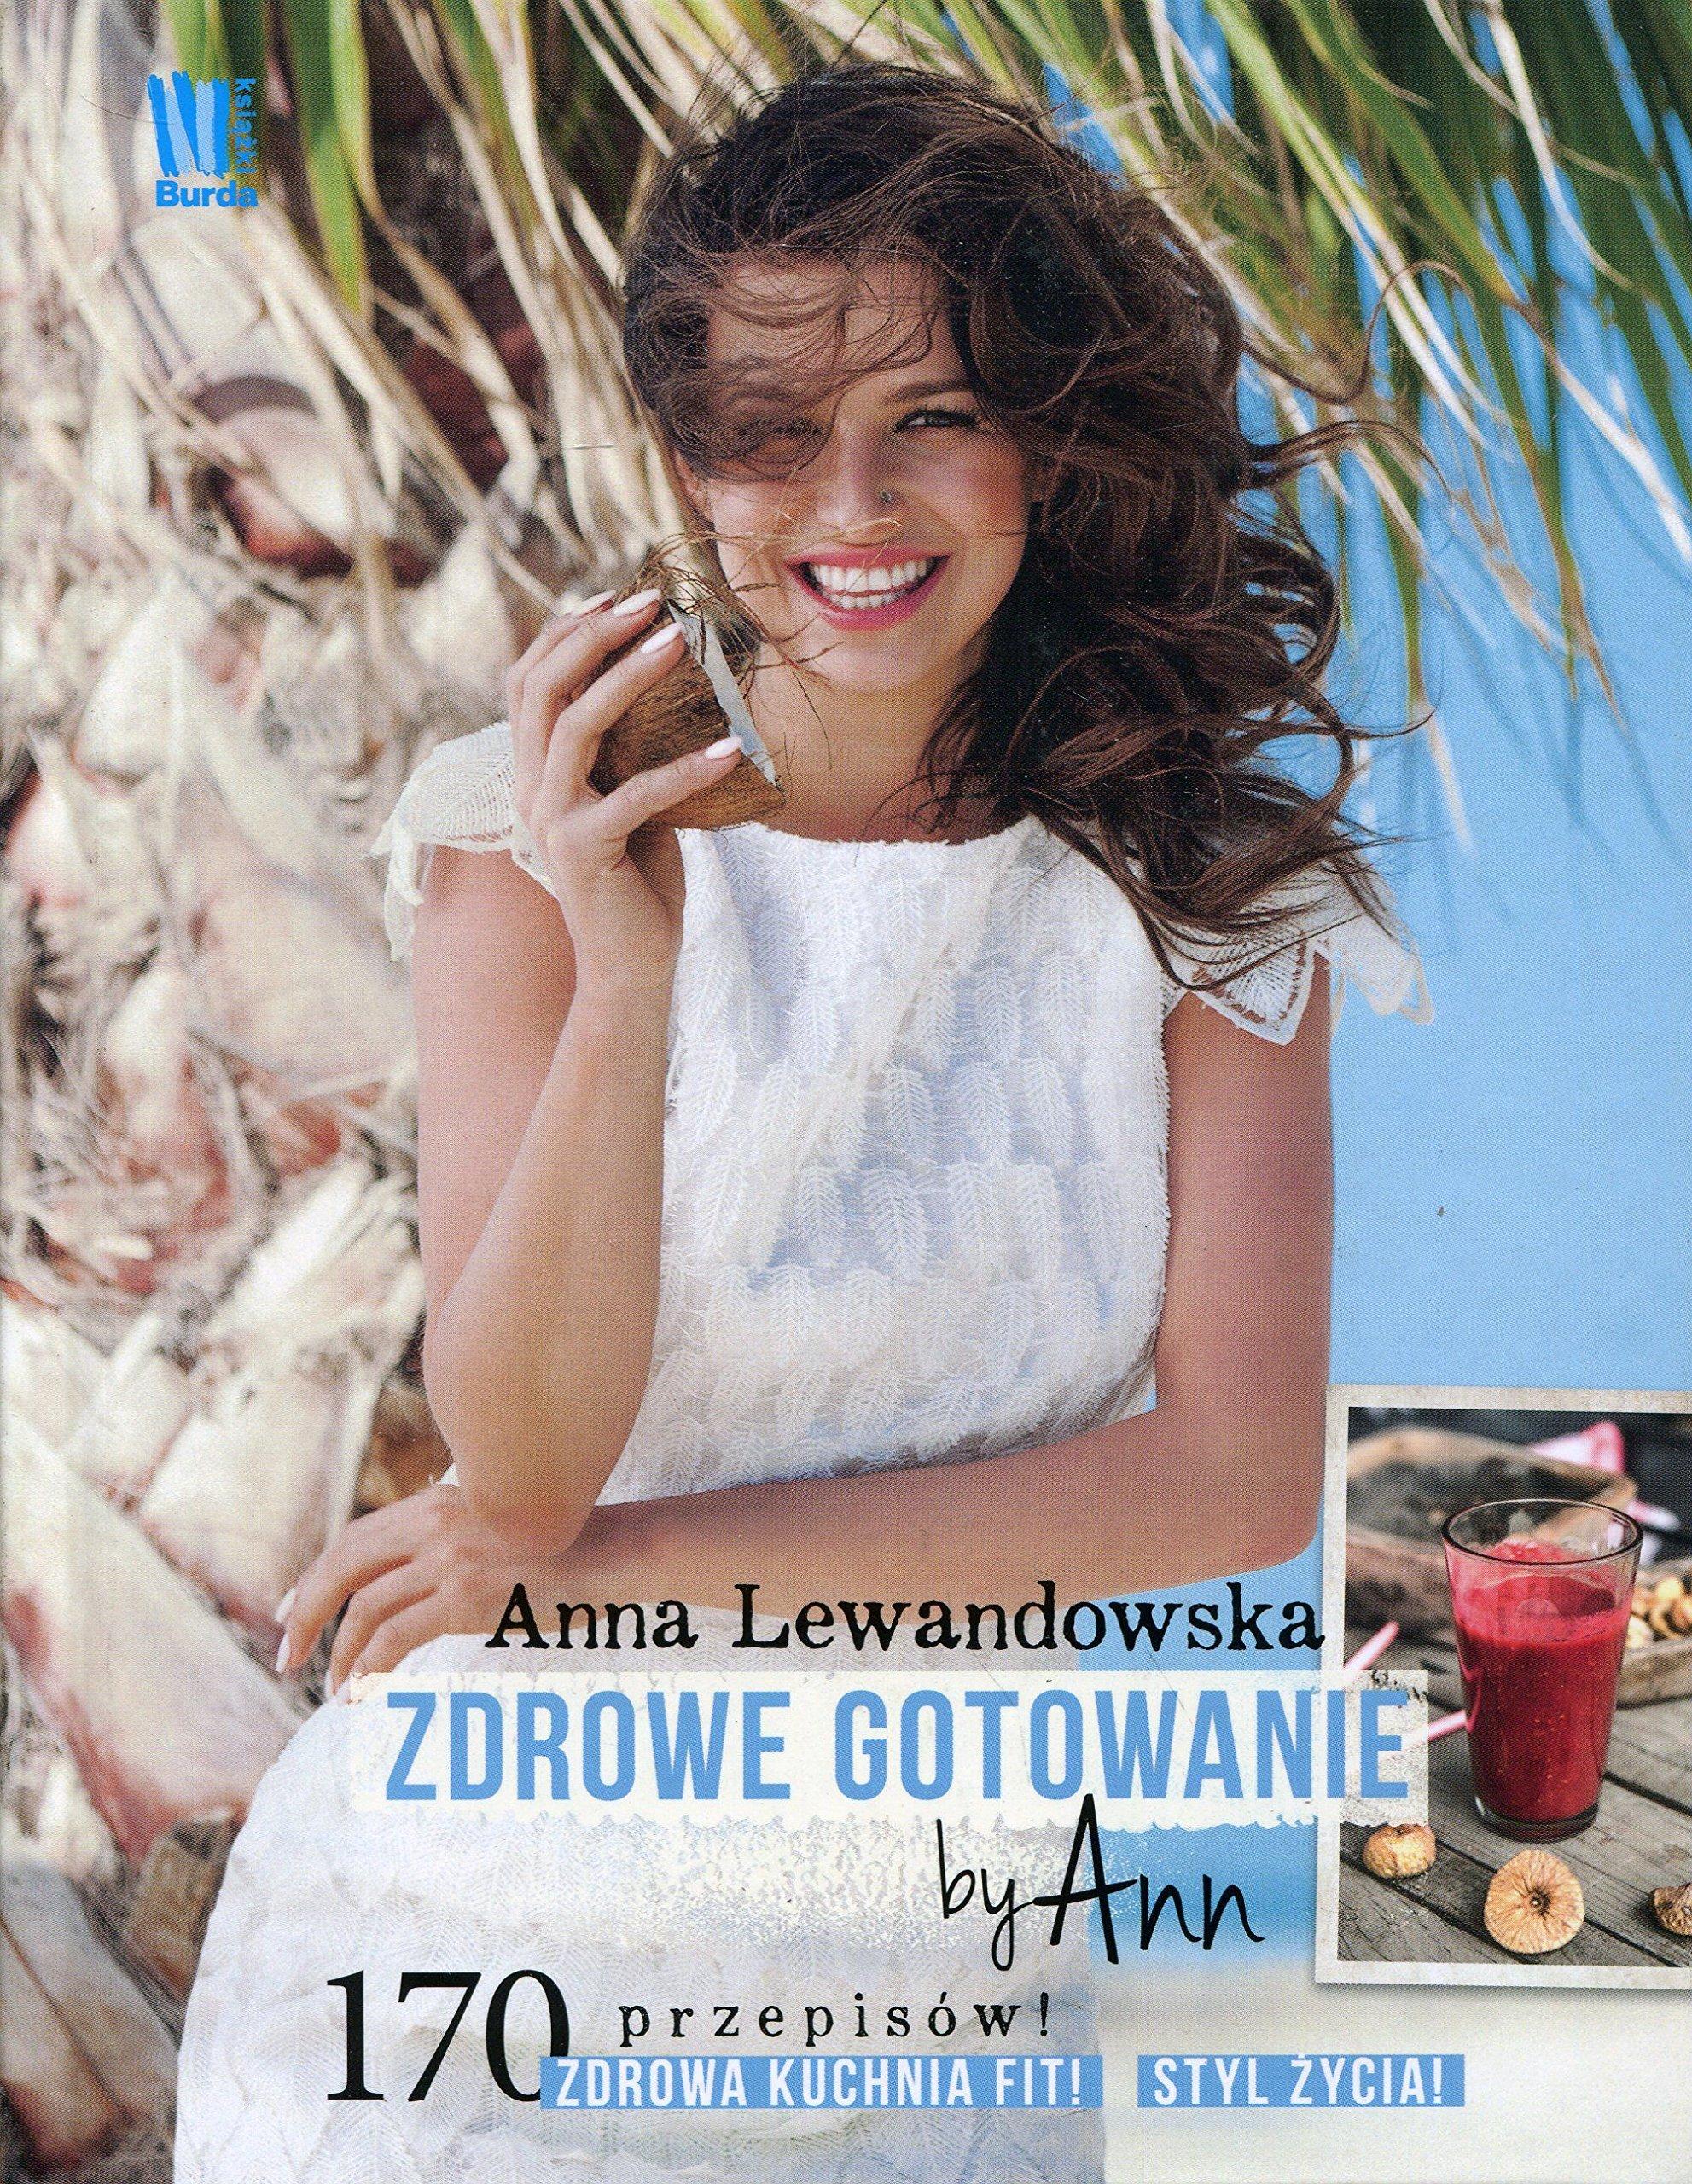 Zdrowe gotowanie by Ann (Polacco) Copertina rigida – 1 gen 2016 Anna Lewandowska Burda Publishing Polska 8380530942 COOKING / Reference